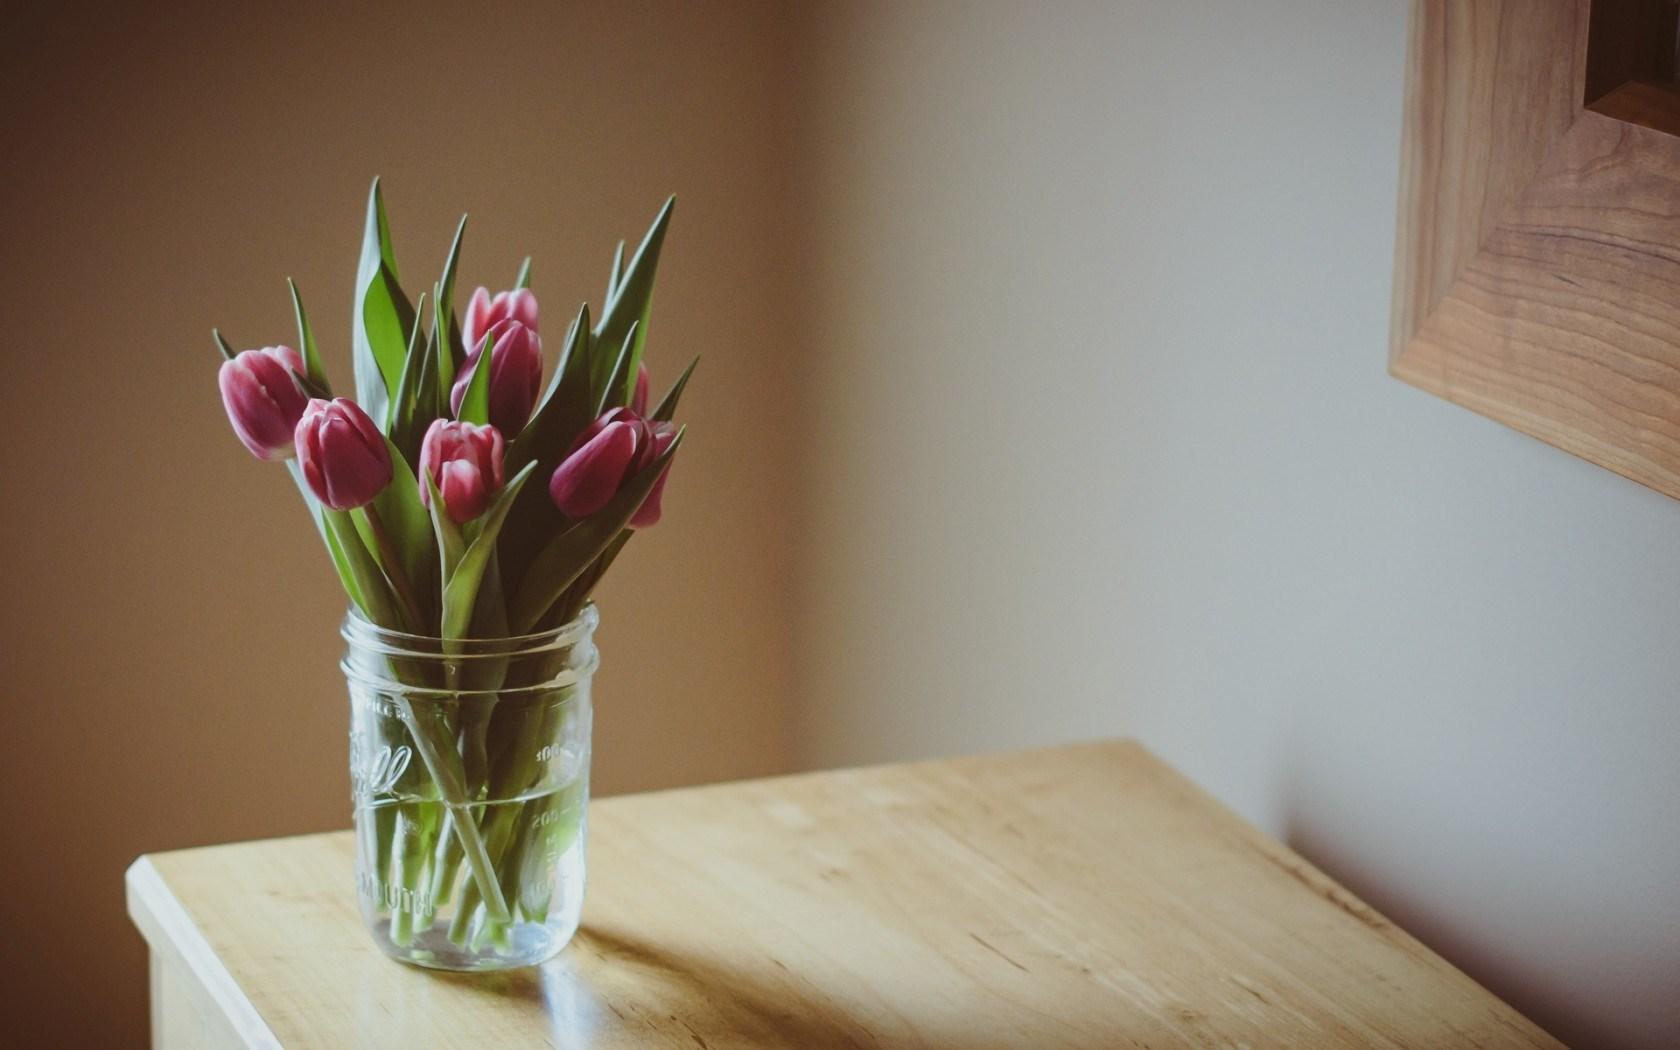 flowers pink tulips vase table